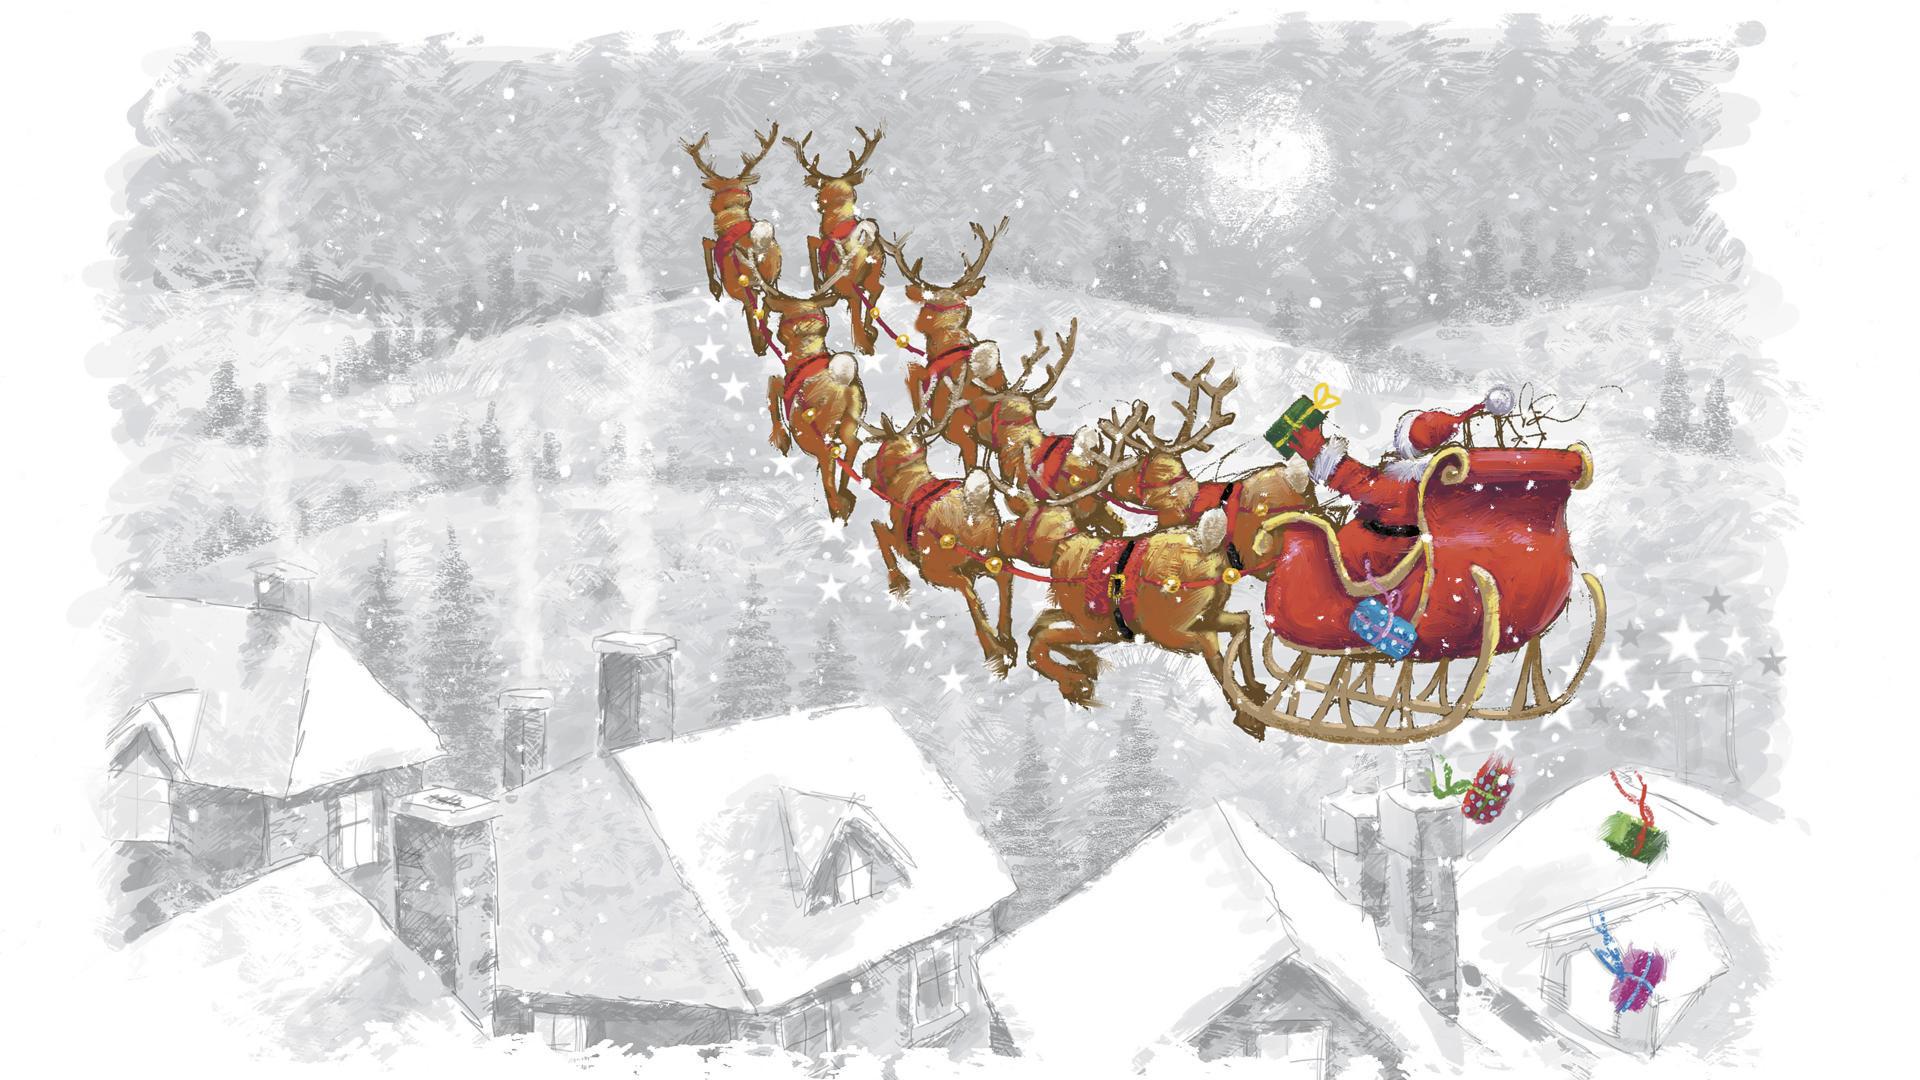 Holidays Christmas Seasonal Festive Hd Wallpaper 1467018